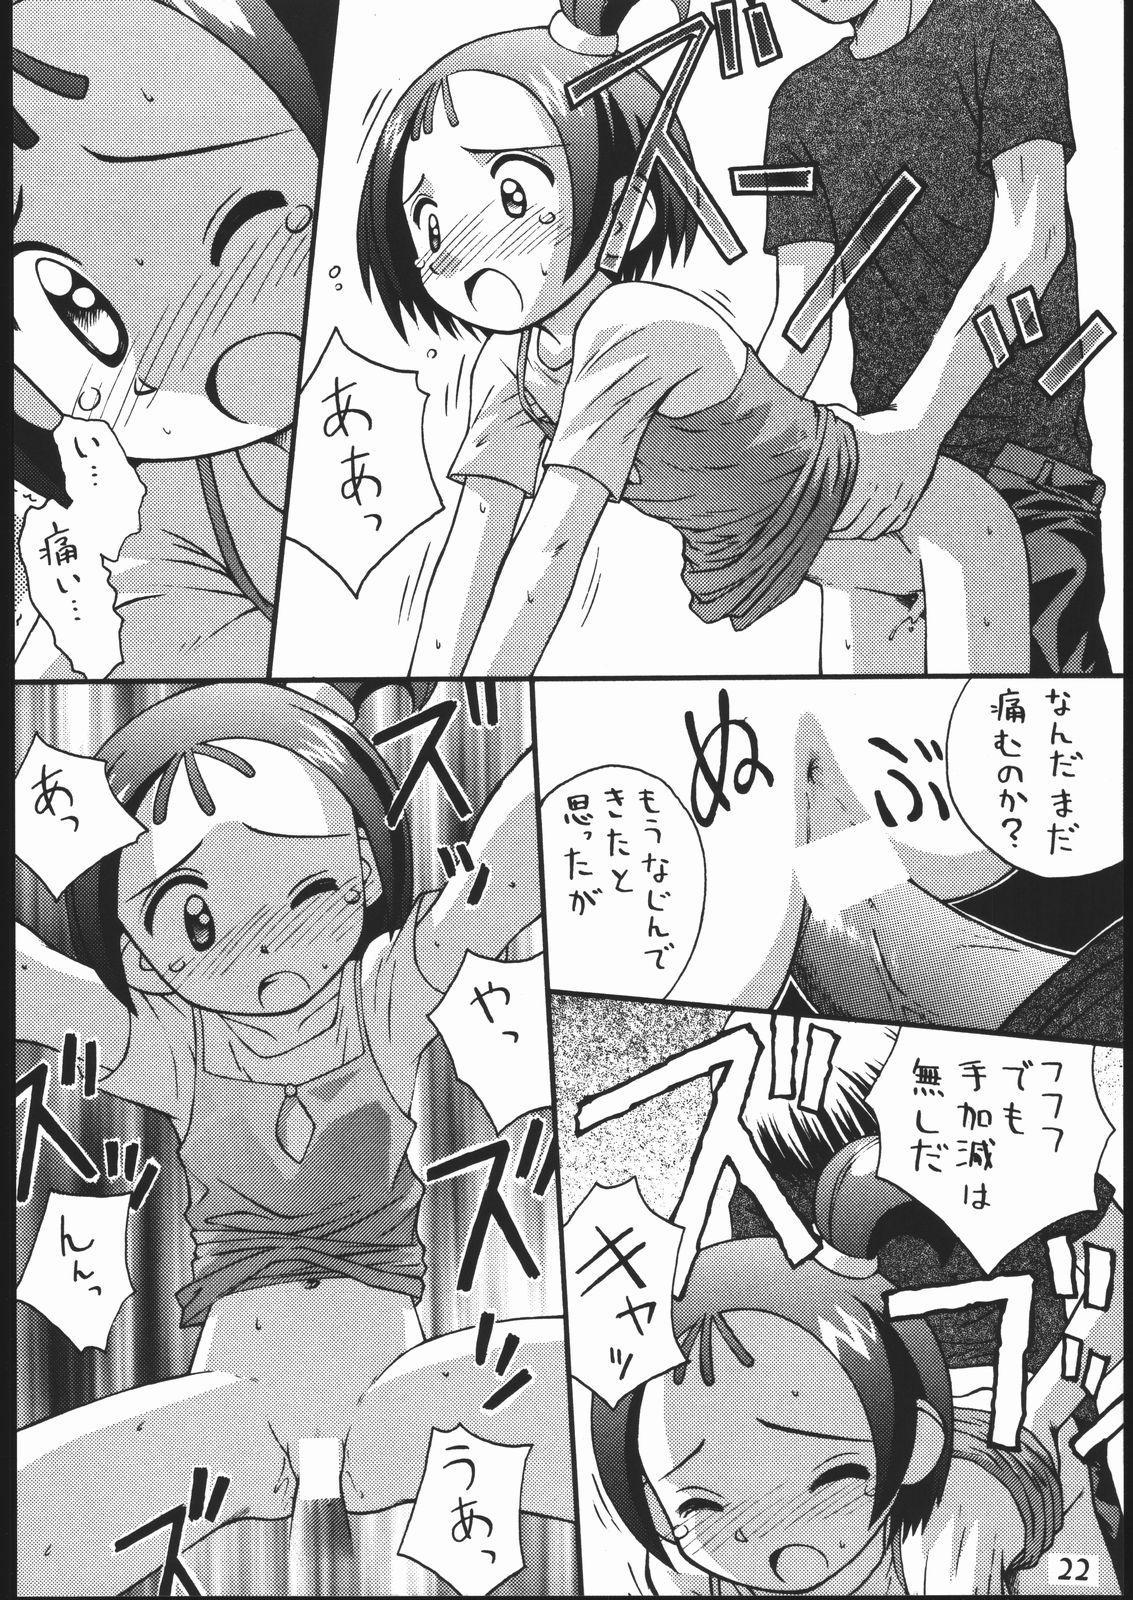 Kakumei Seisen Dai Go Gou 20